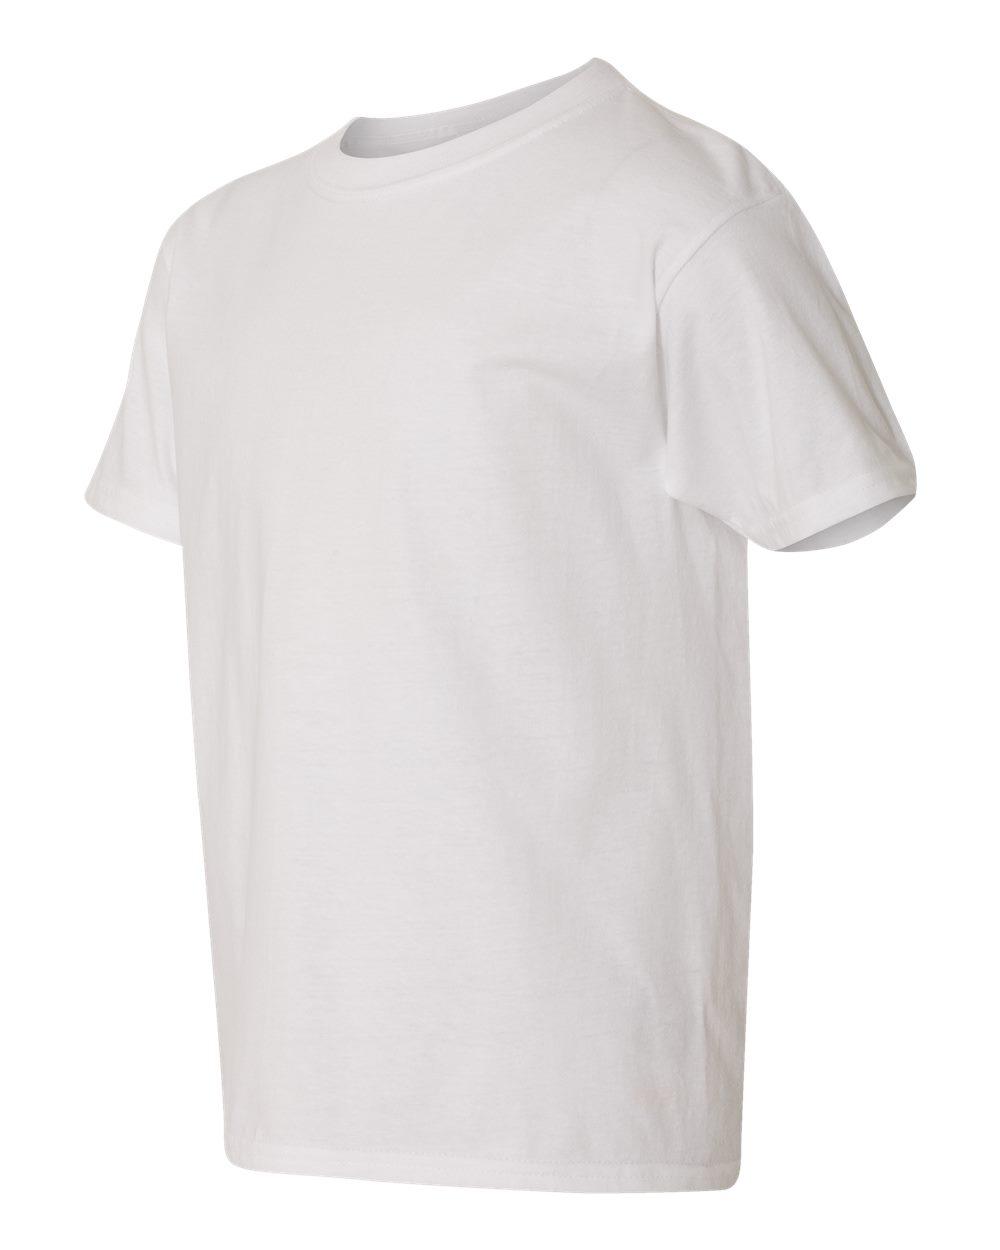 Gildan 64500B - SoftStyle Youth Short Sleeve T-Shirt